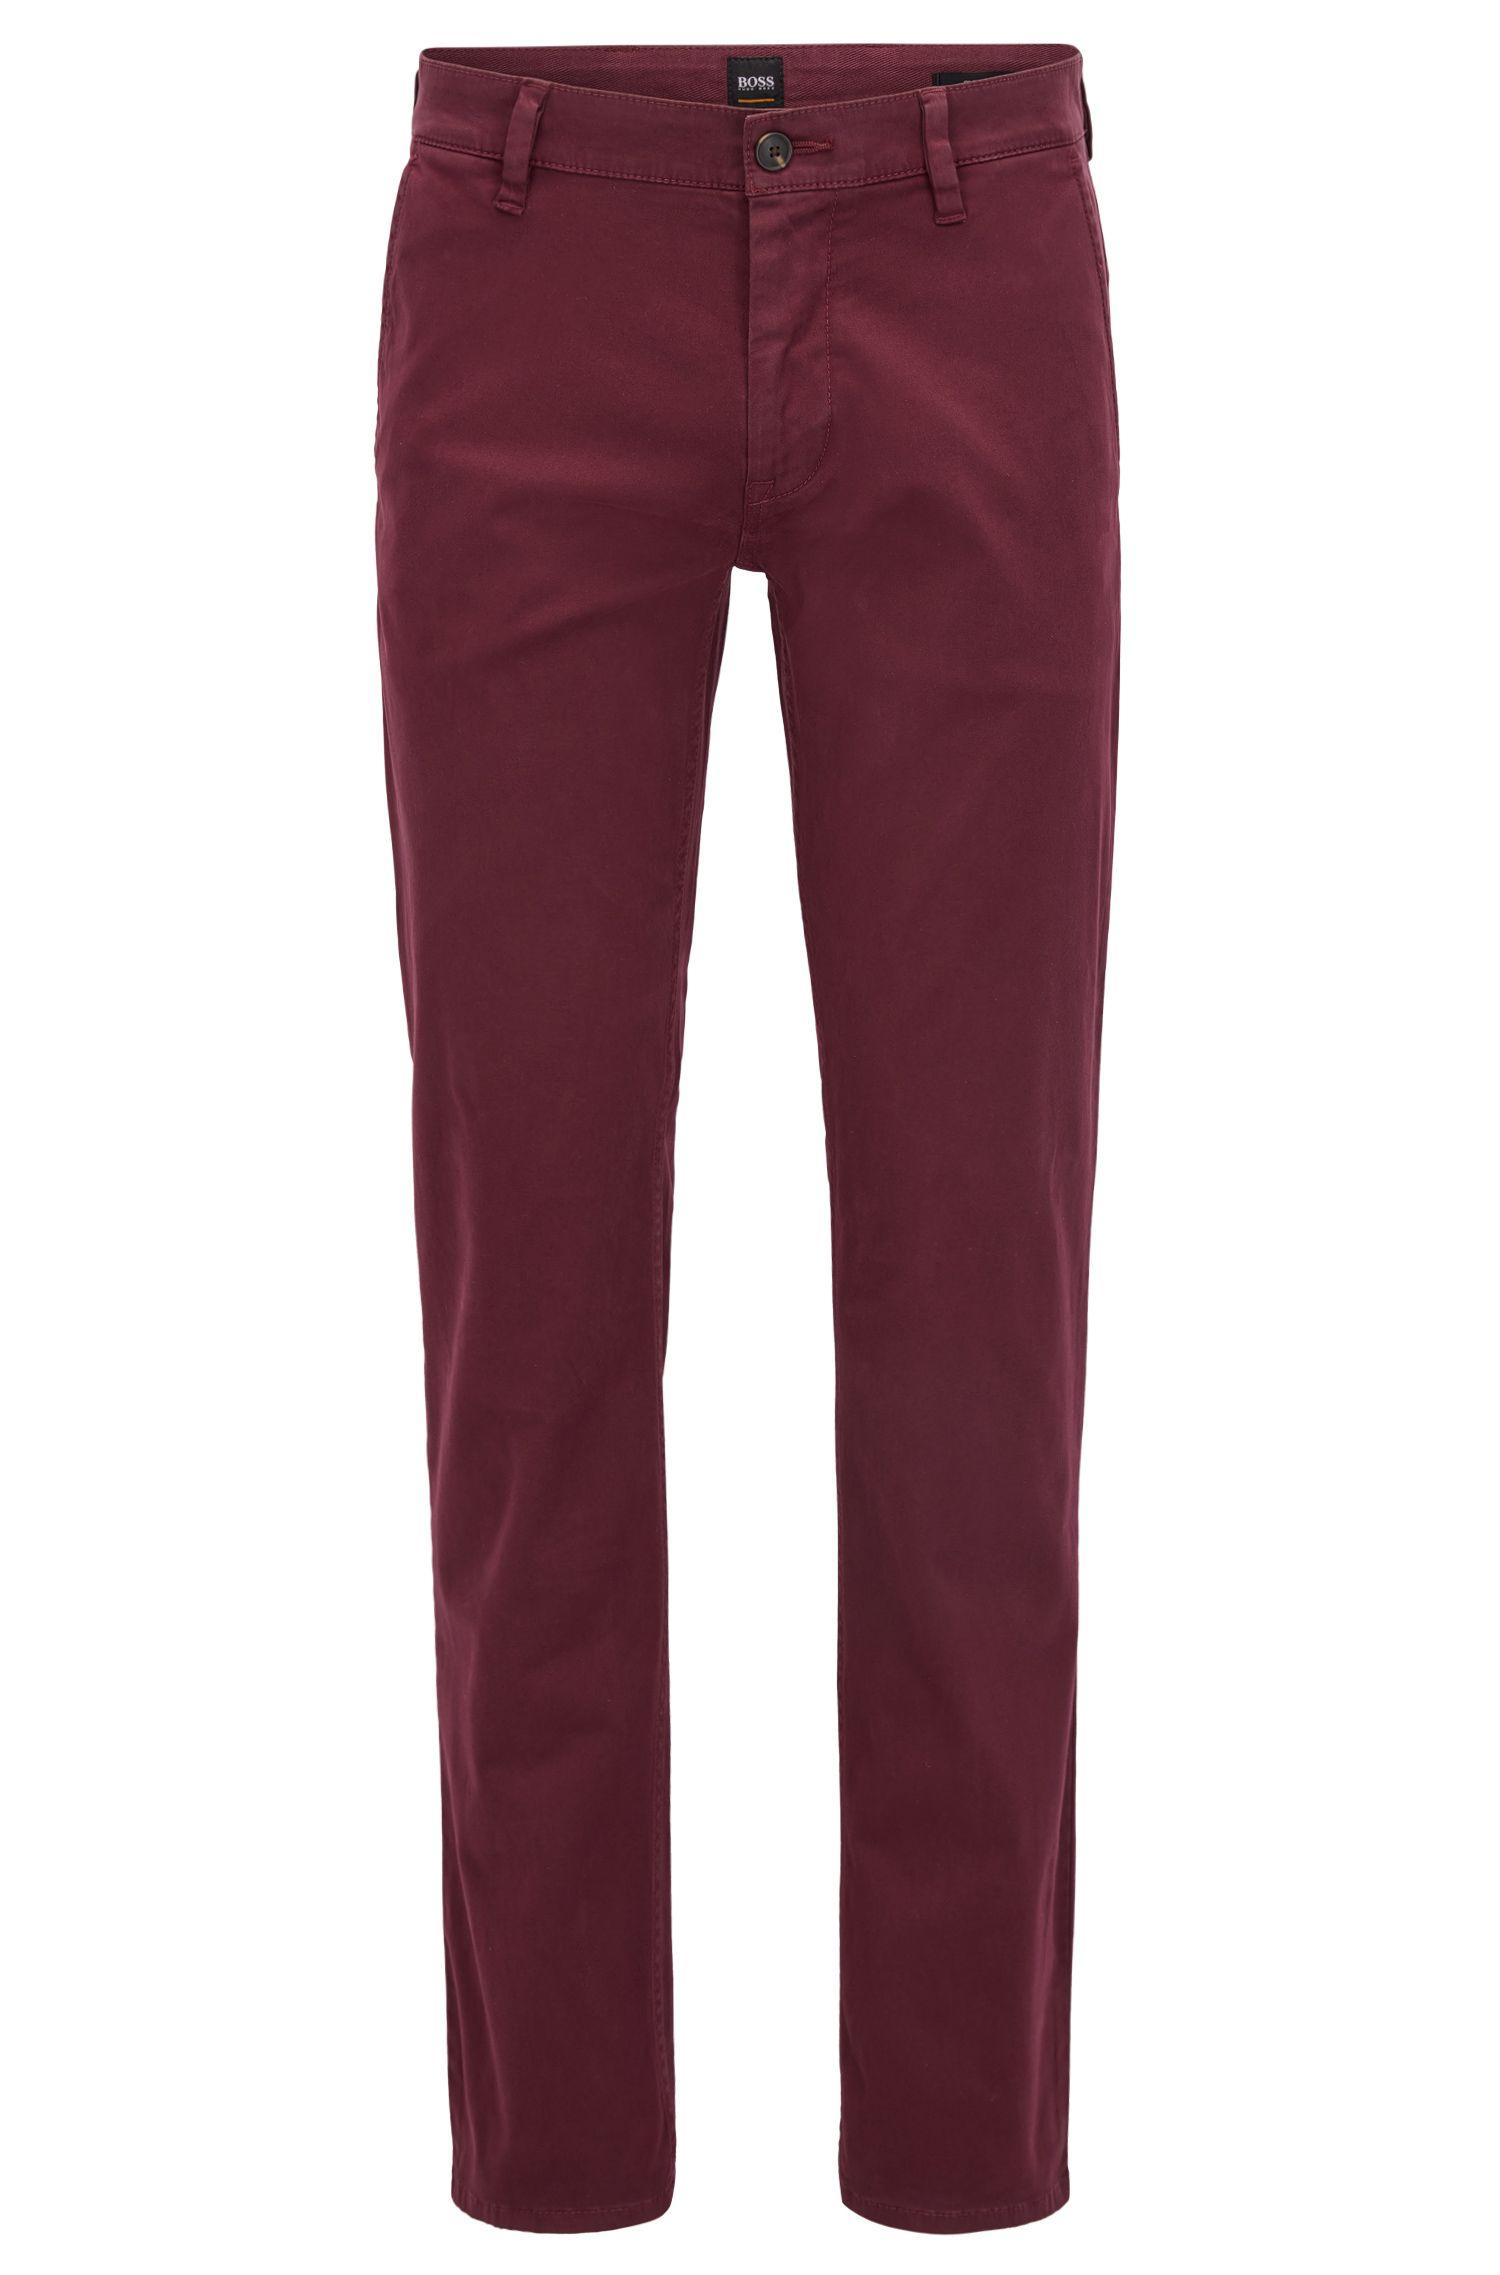 Chino casual Slim Fit en coton stretch brossé